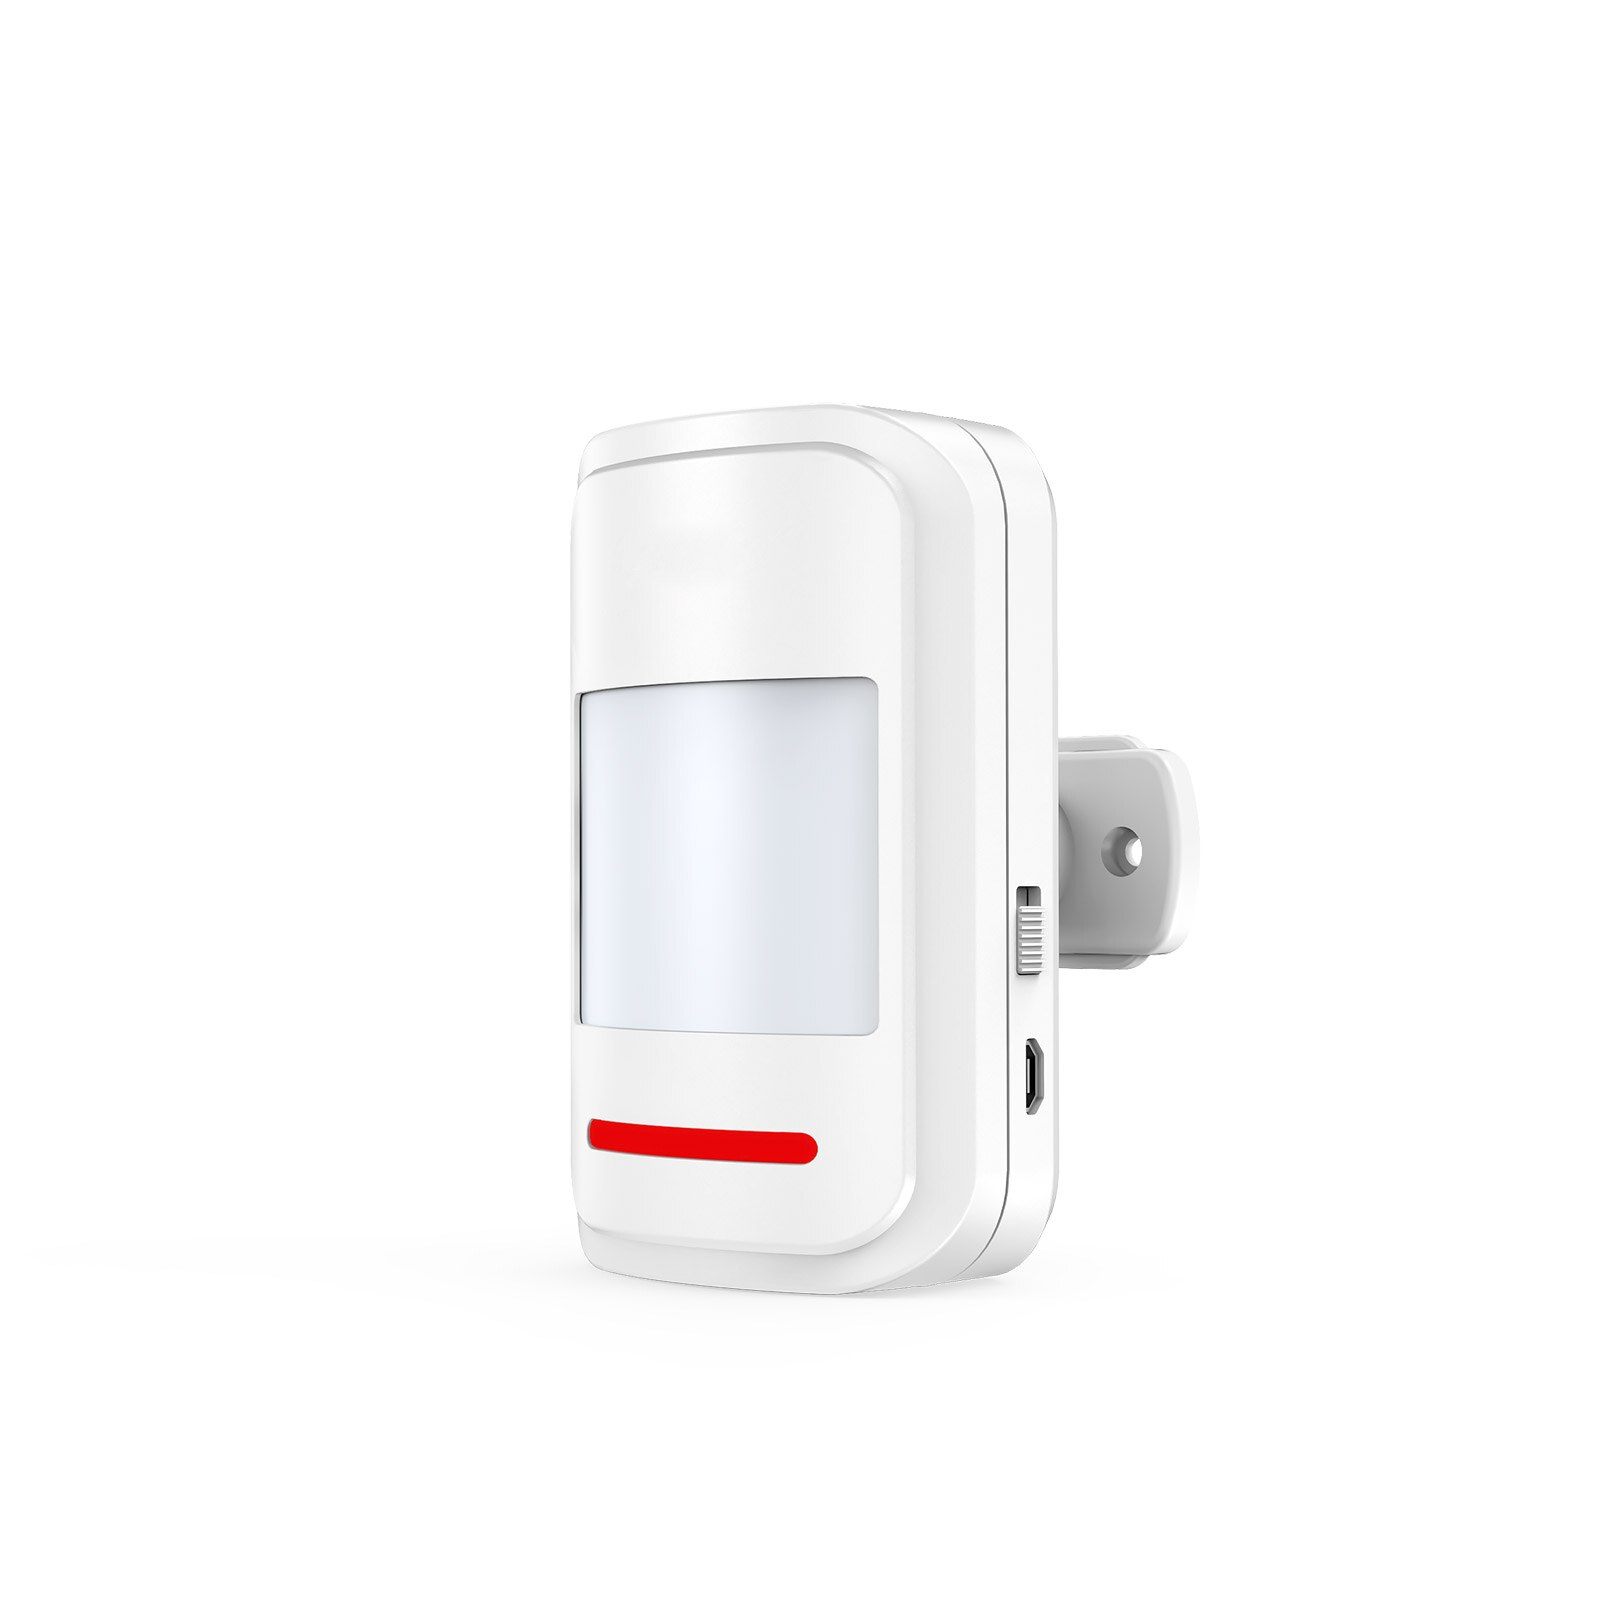 Smart home security alarm system WiFi GSM door and window sensor infrared detector sensor anti-theft signal device enlarge